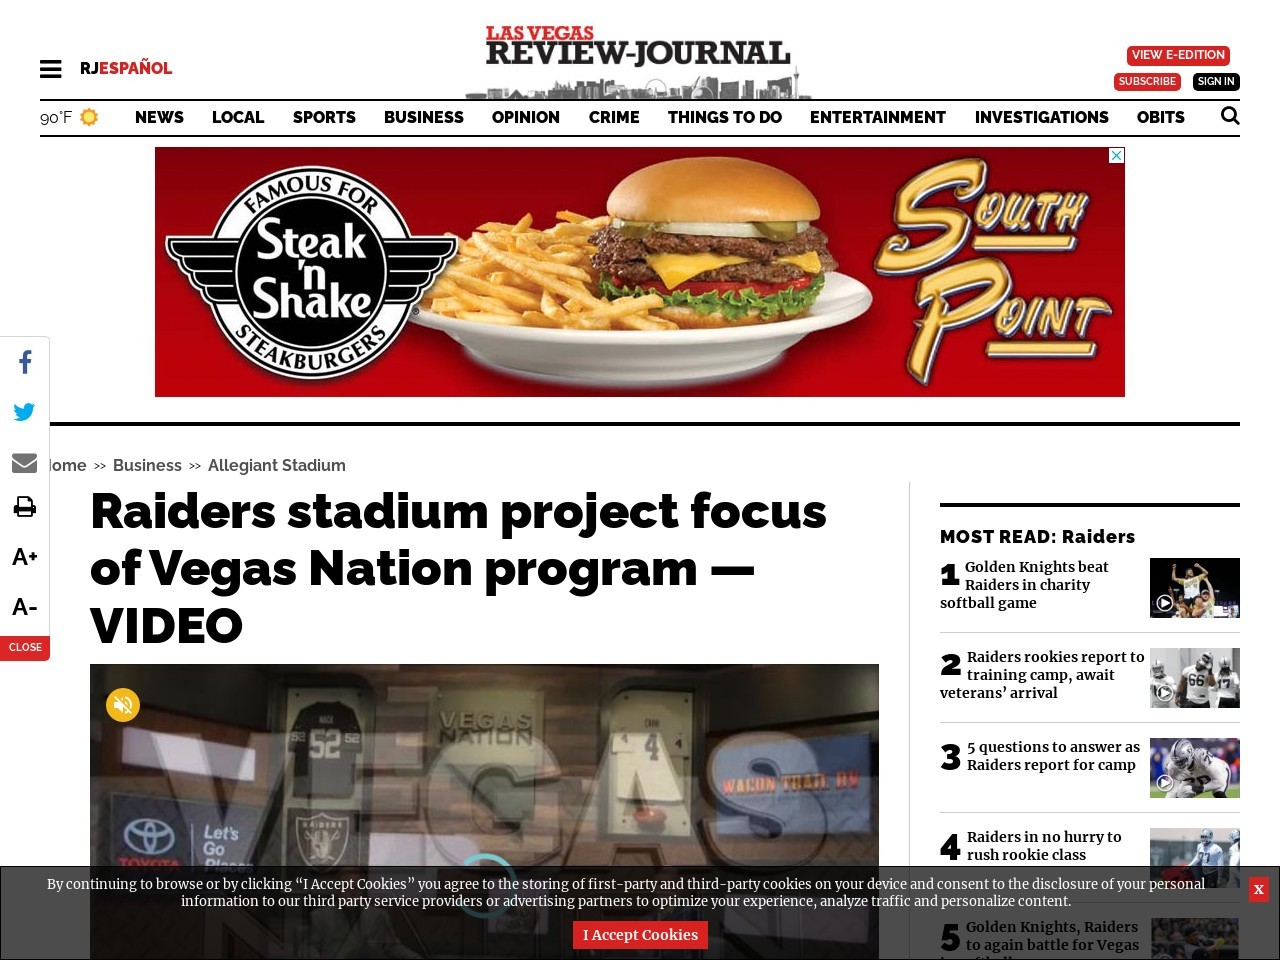 Raiders stadium project focus of Vegas Nation program — VIDEO